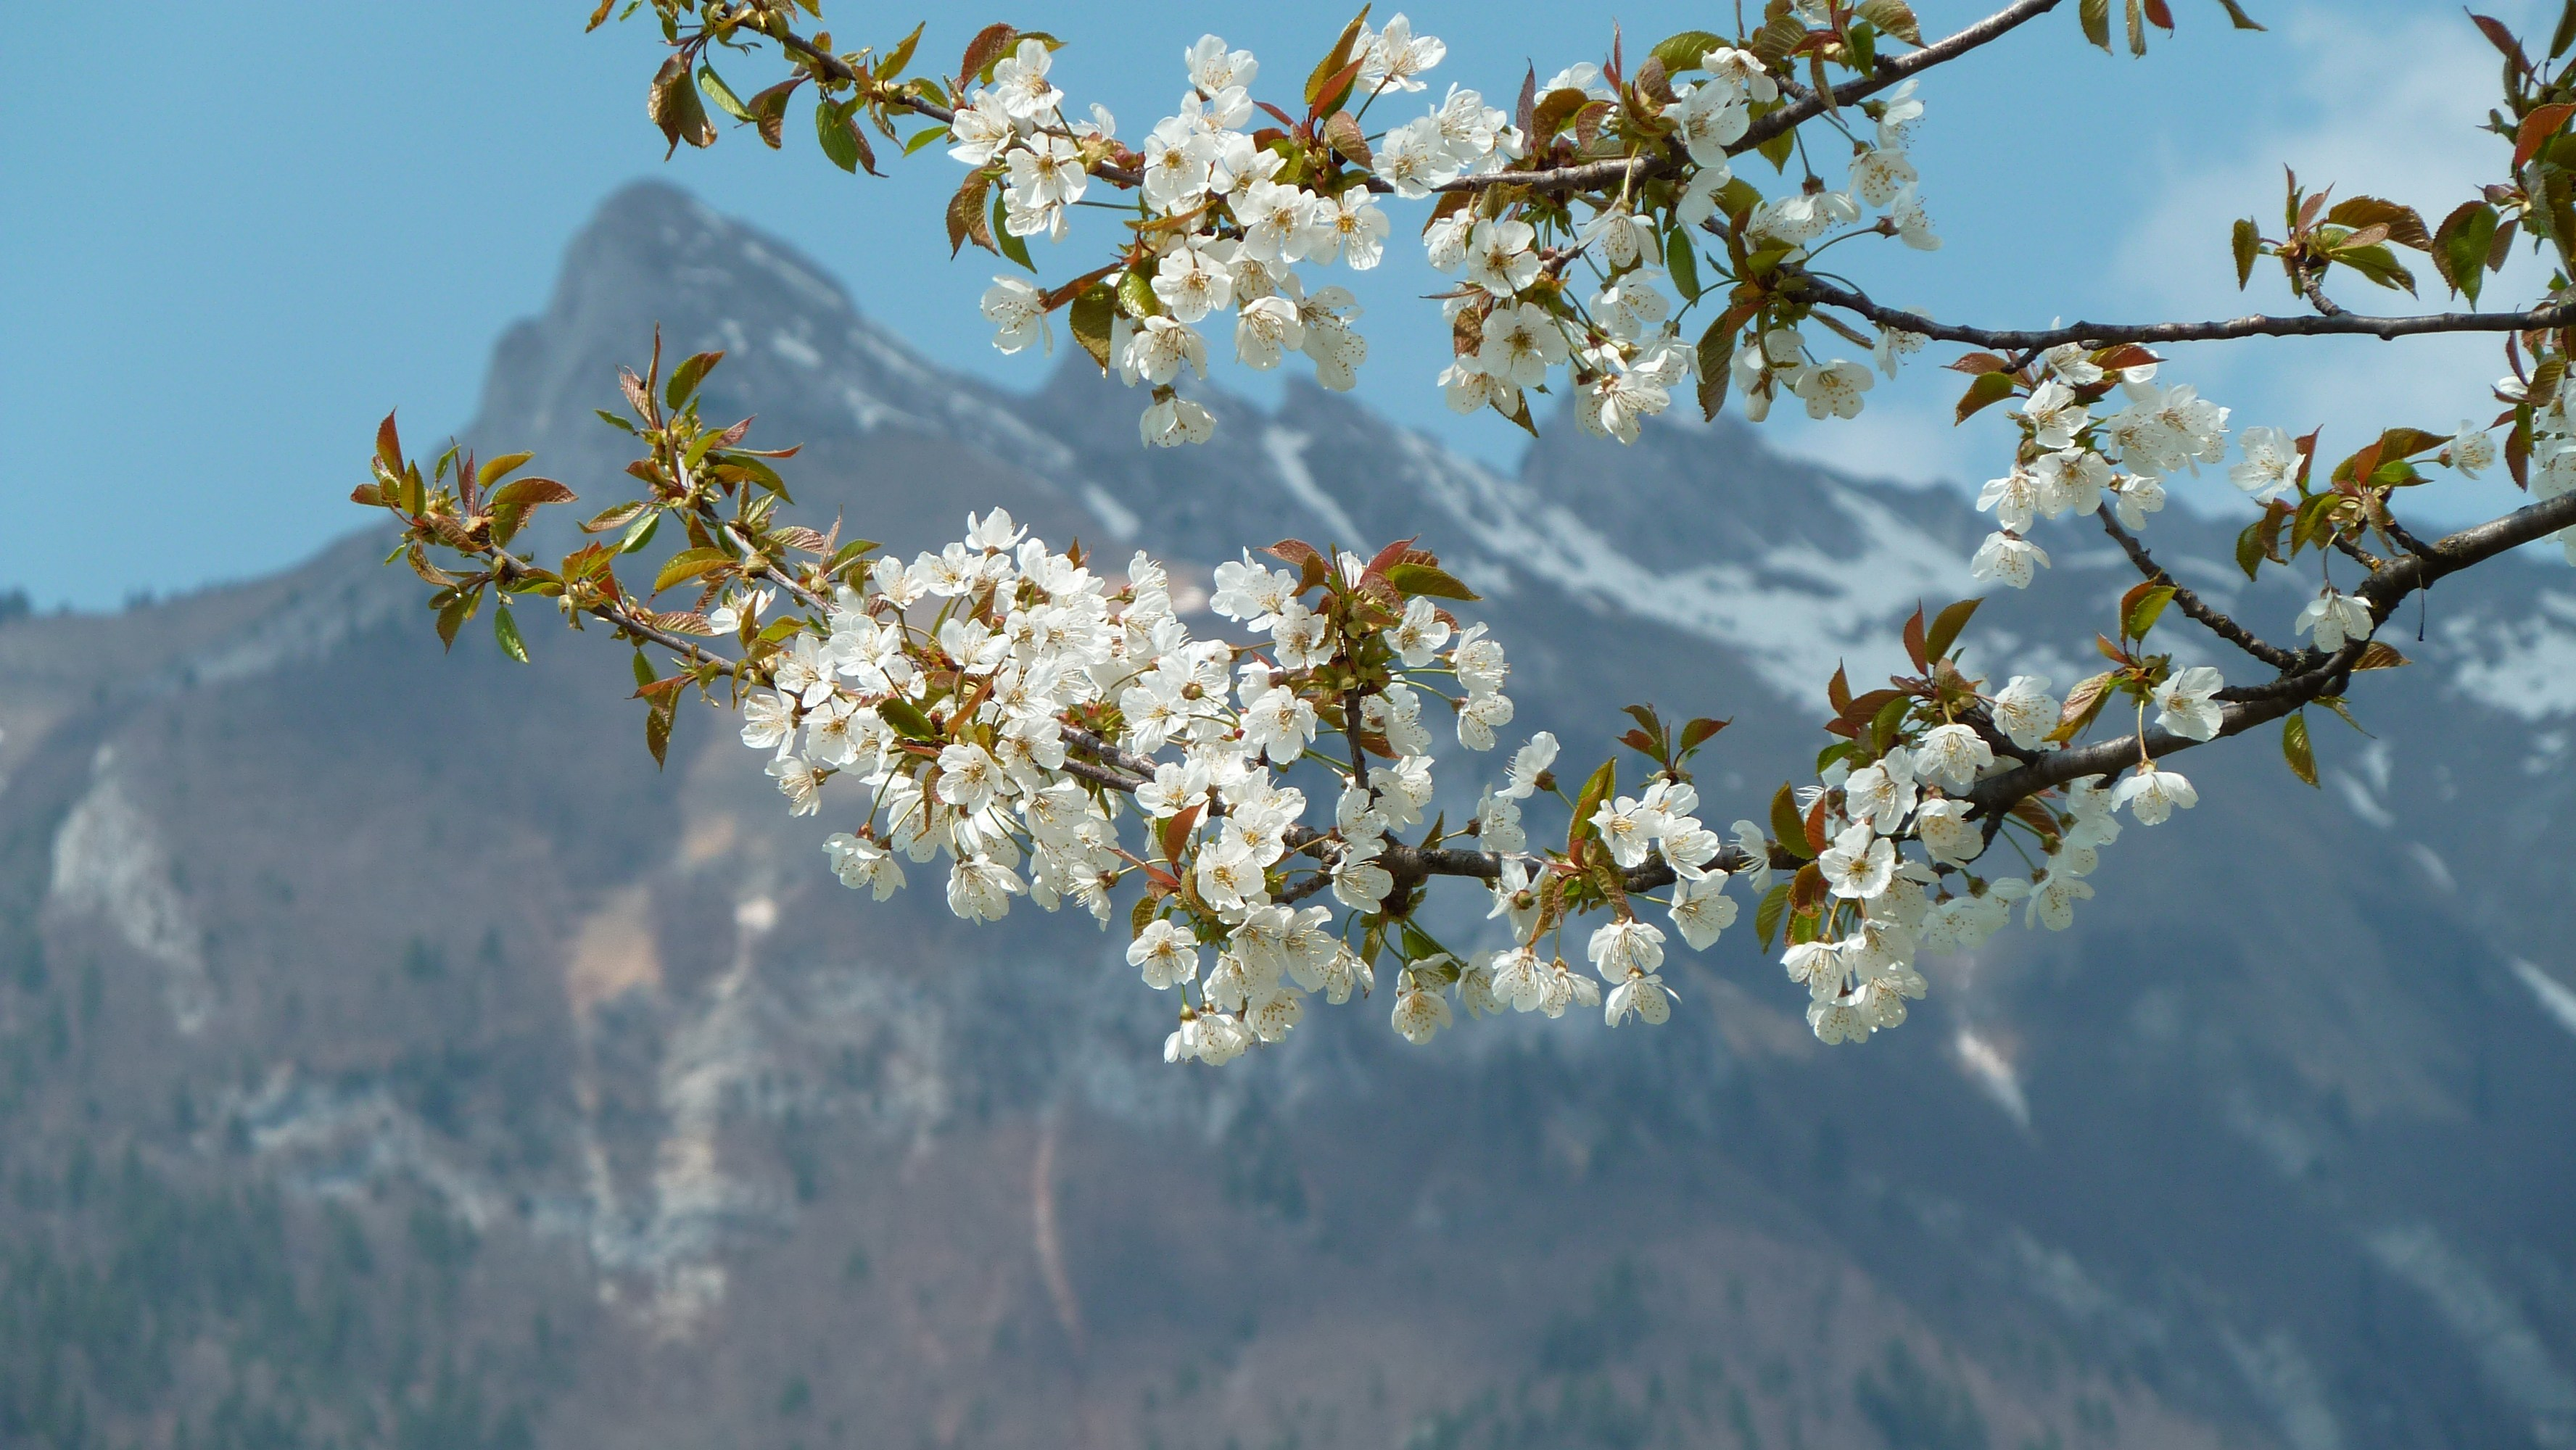 301 moved permanently for Images du printemps gratuites